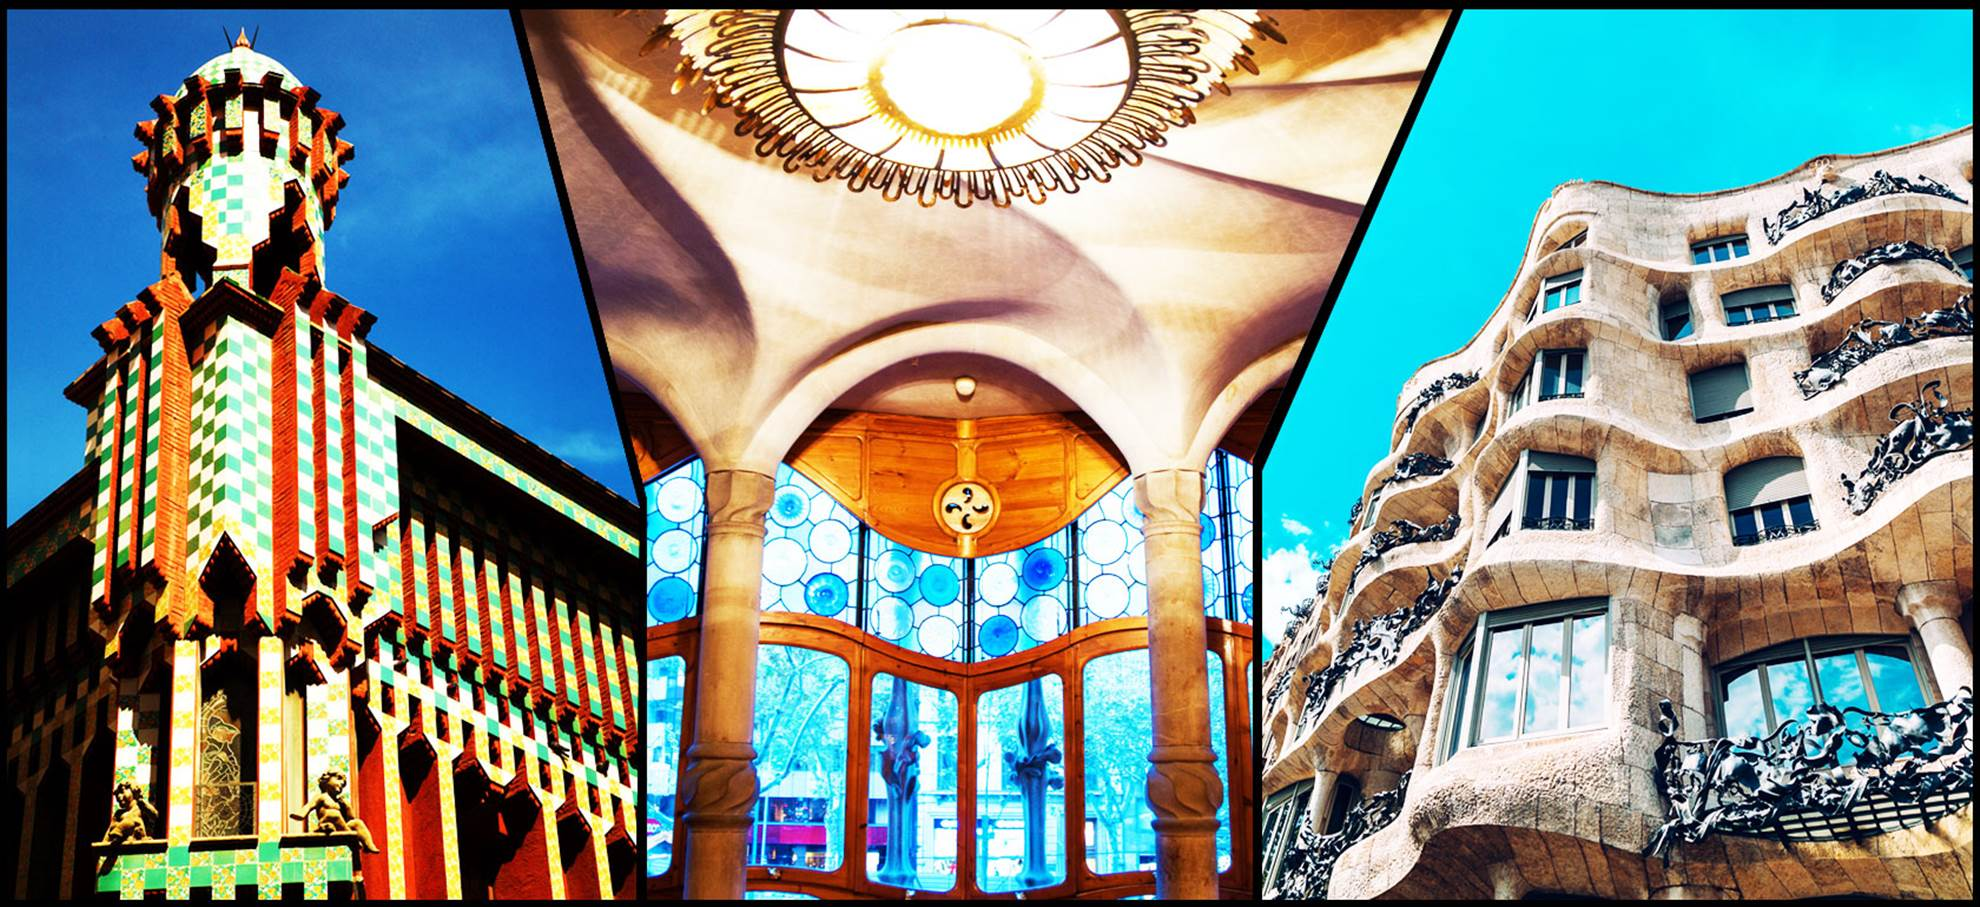 As 3 casas de Gaudi: Entrada direta a Casa Batlló, Mila e Vicens!